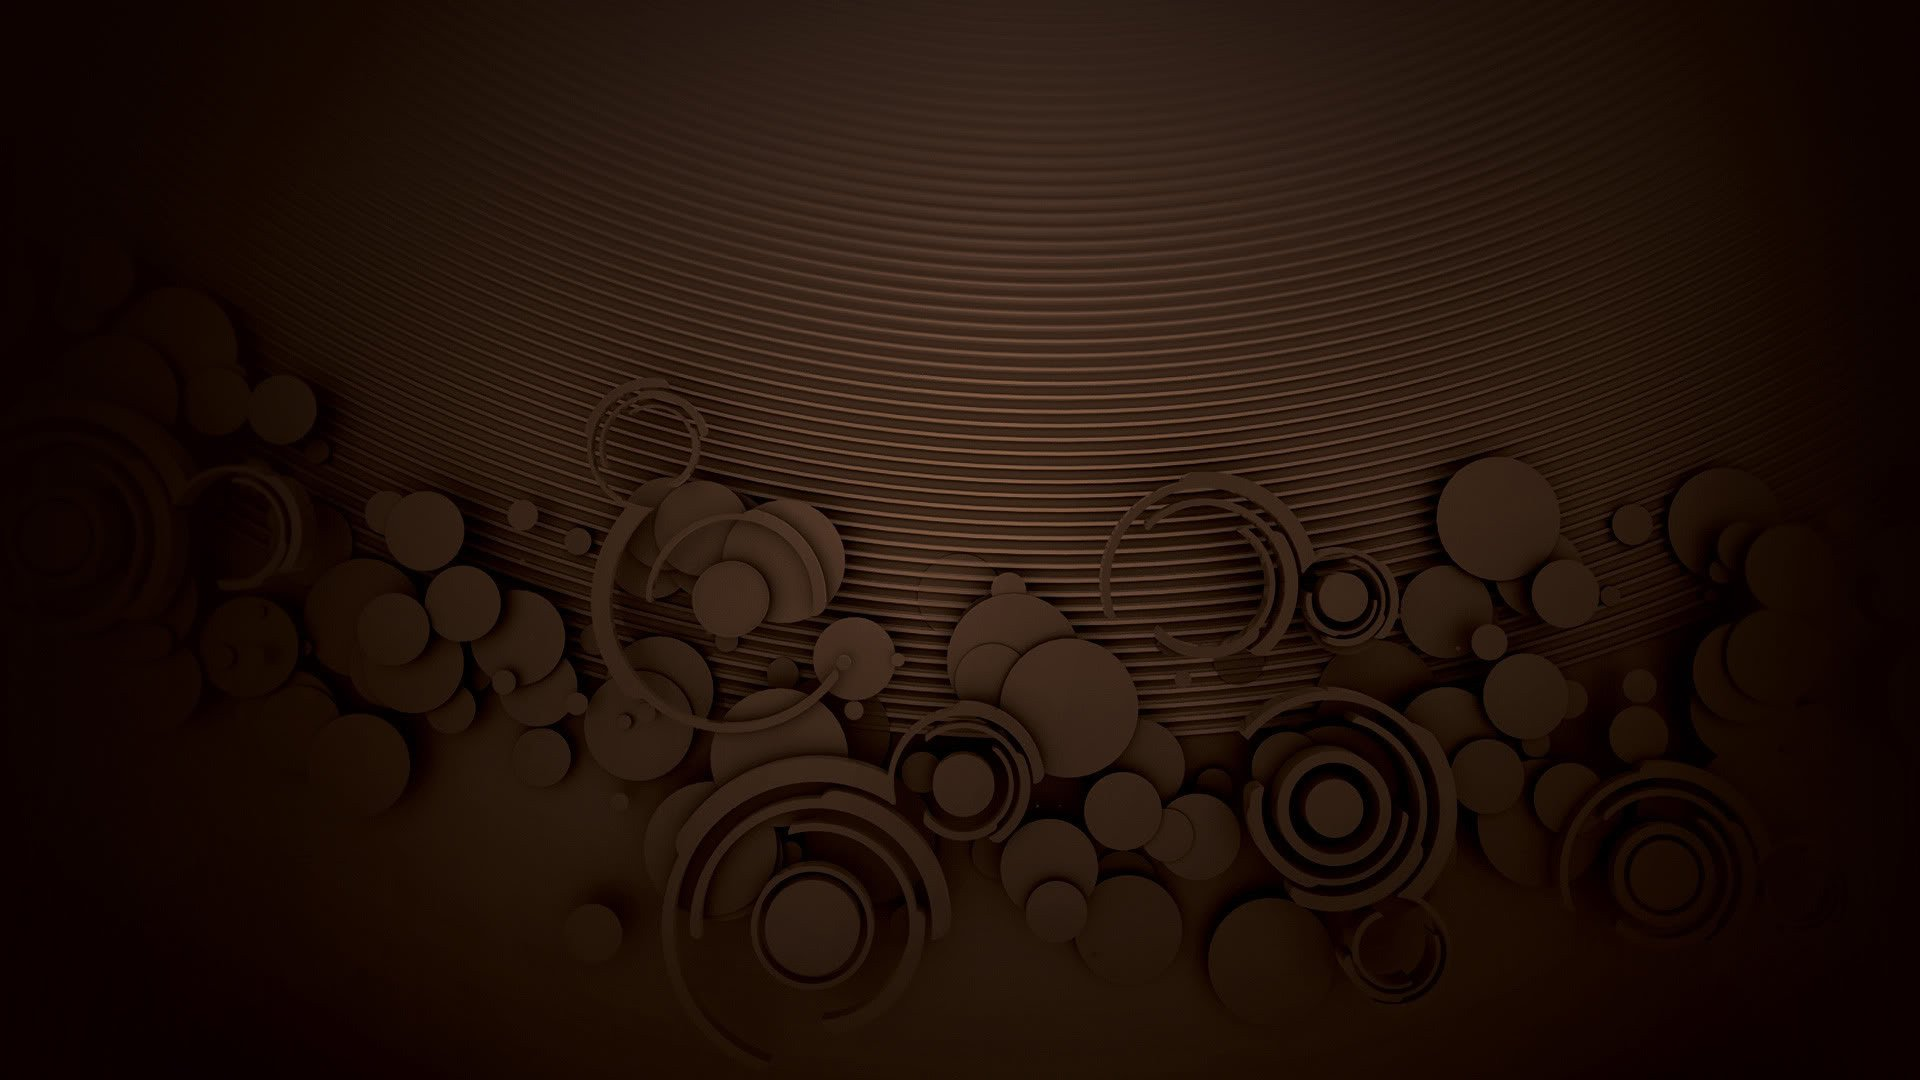 Cool Brown Wallpaper